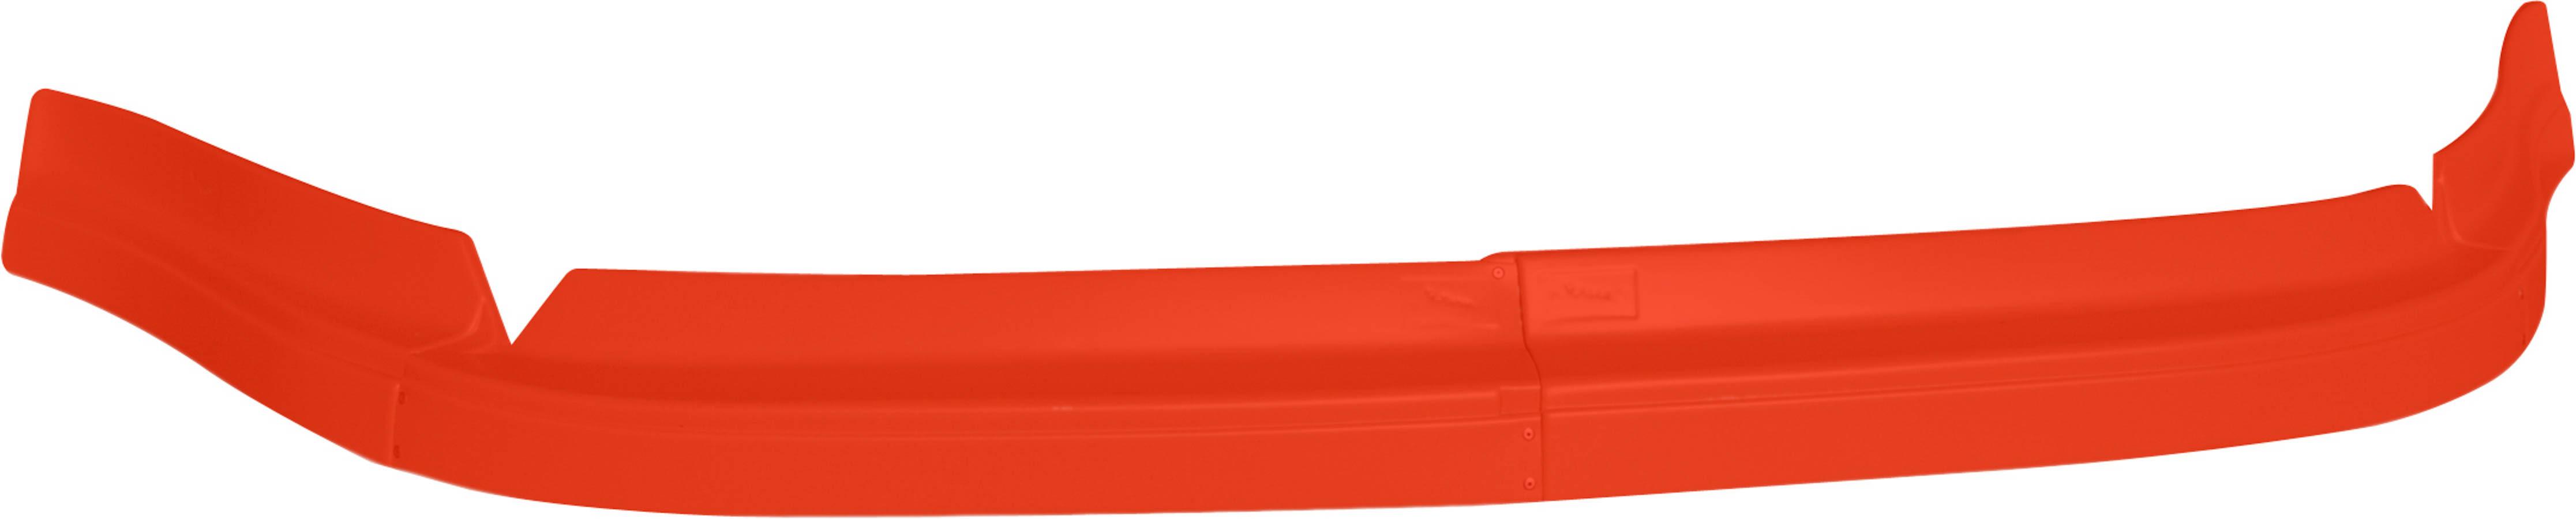 Lower Air Valance For MD3 Dirt Nose Orange